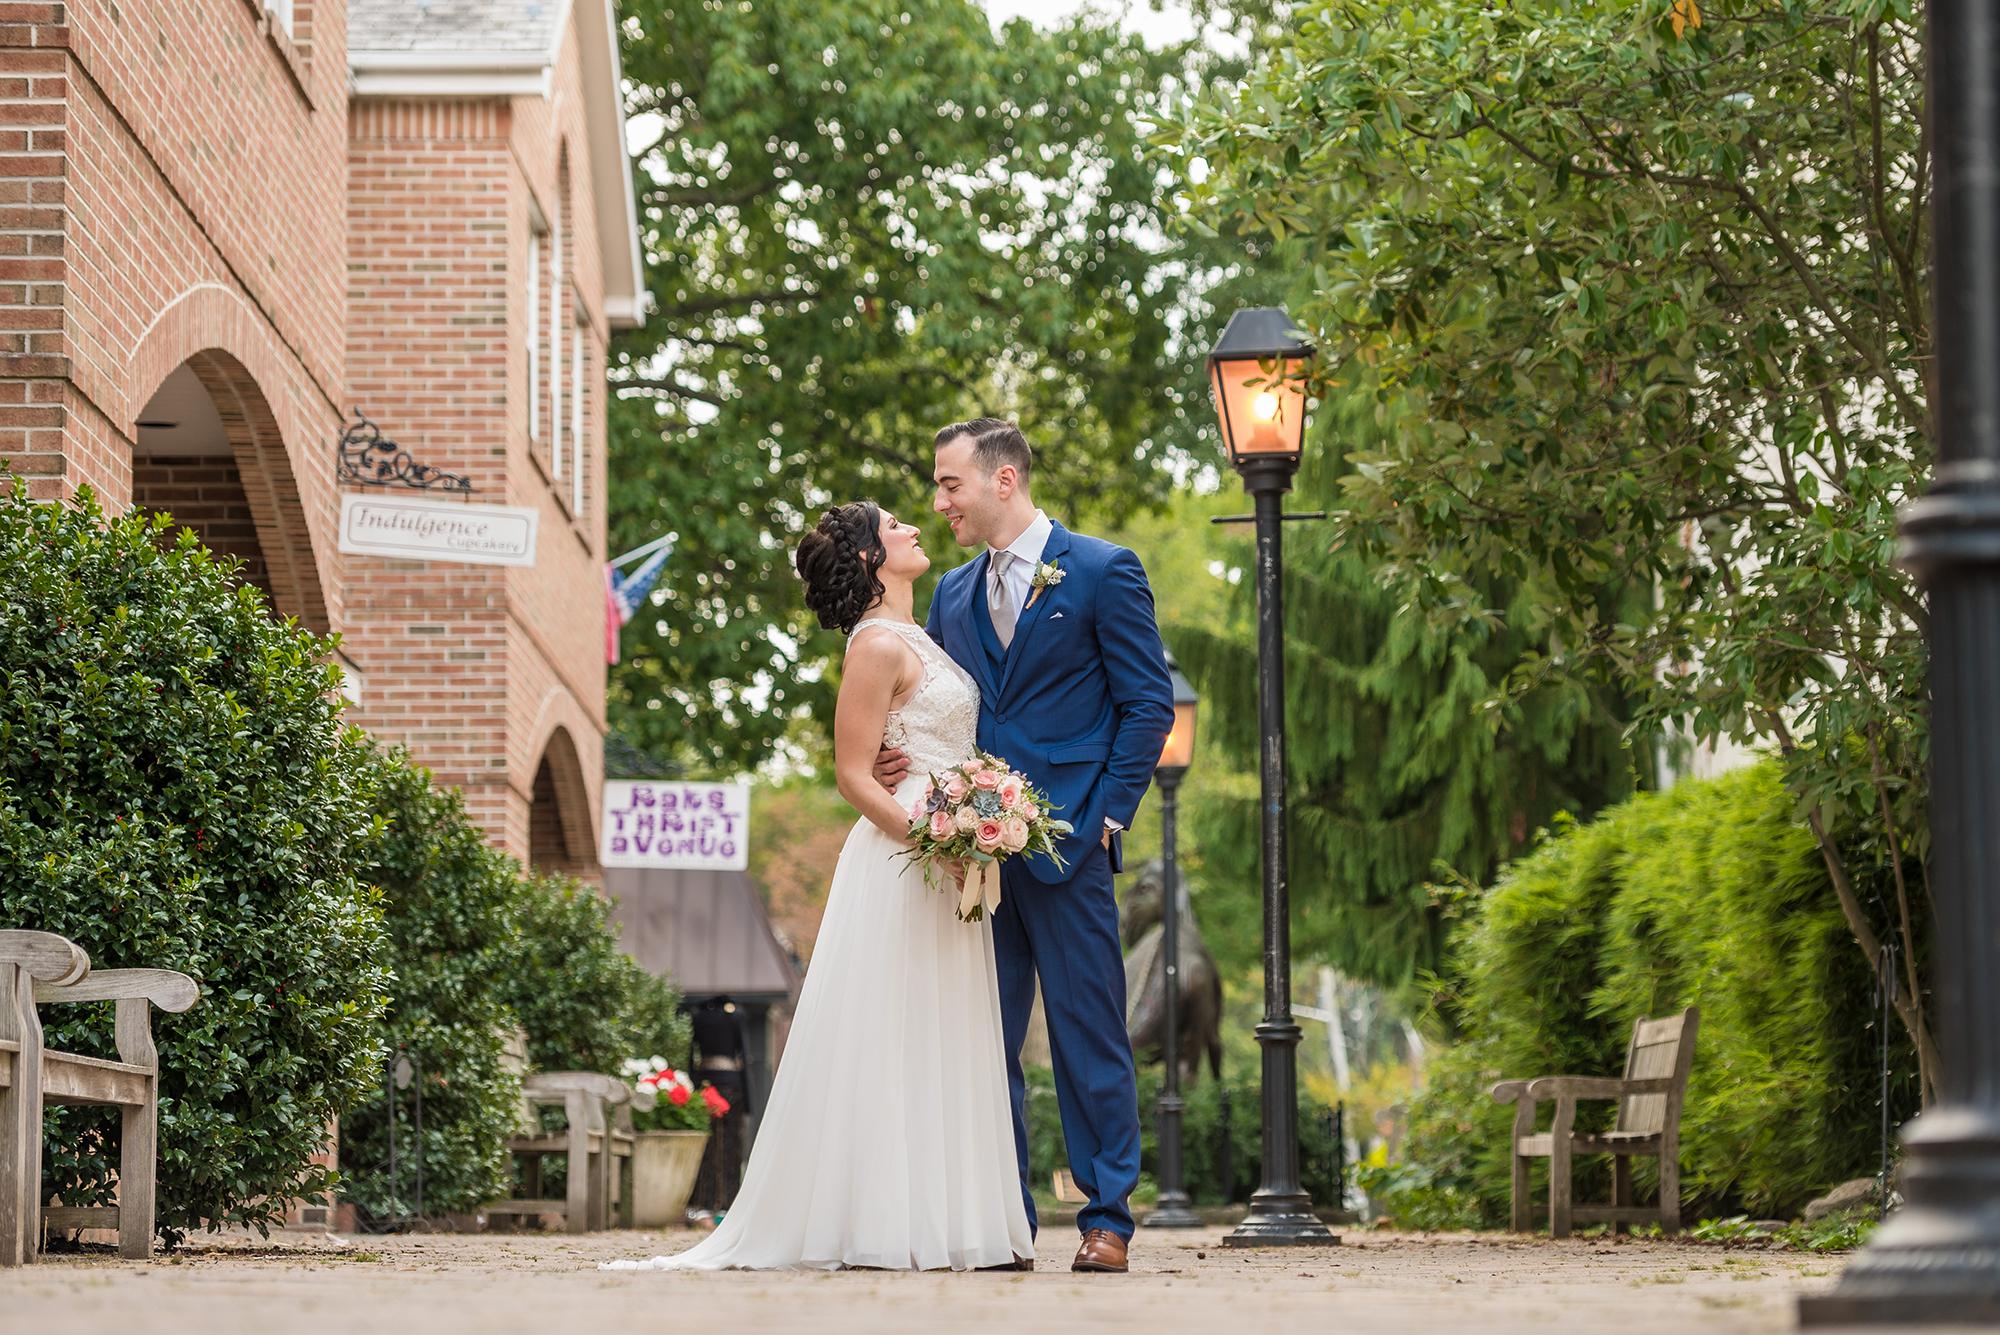 trenos-wedding-lbi-photographer-10.jpg